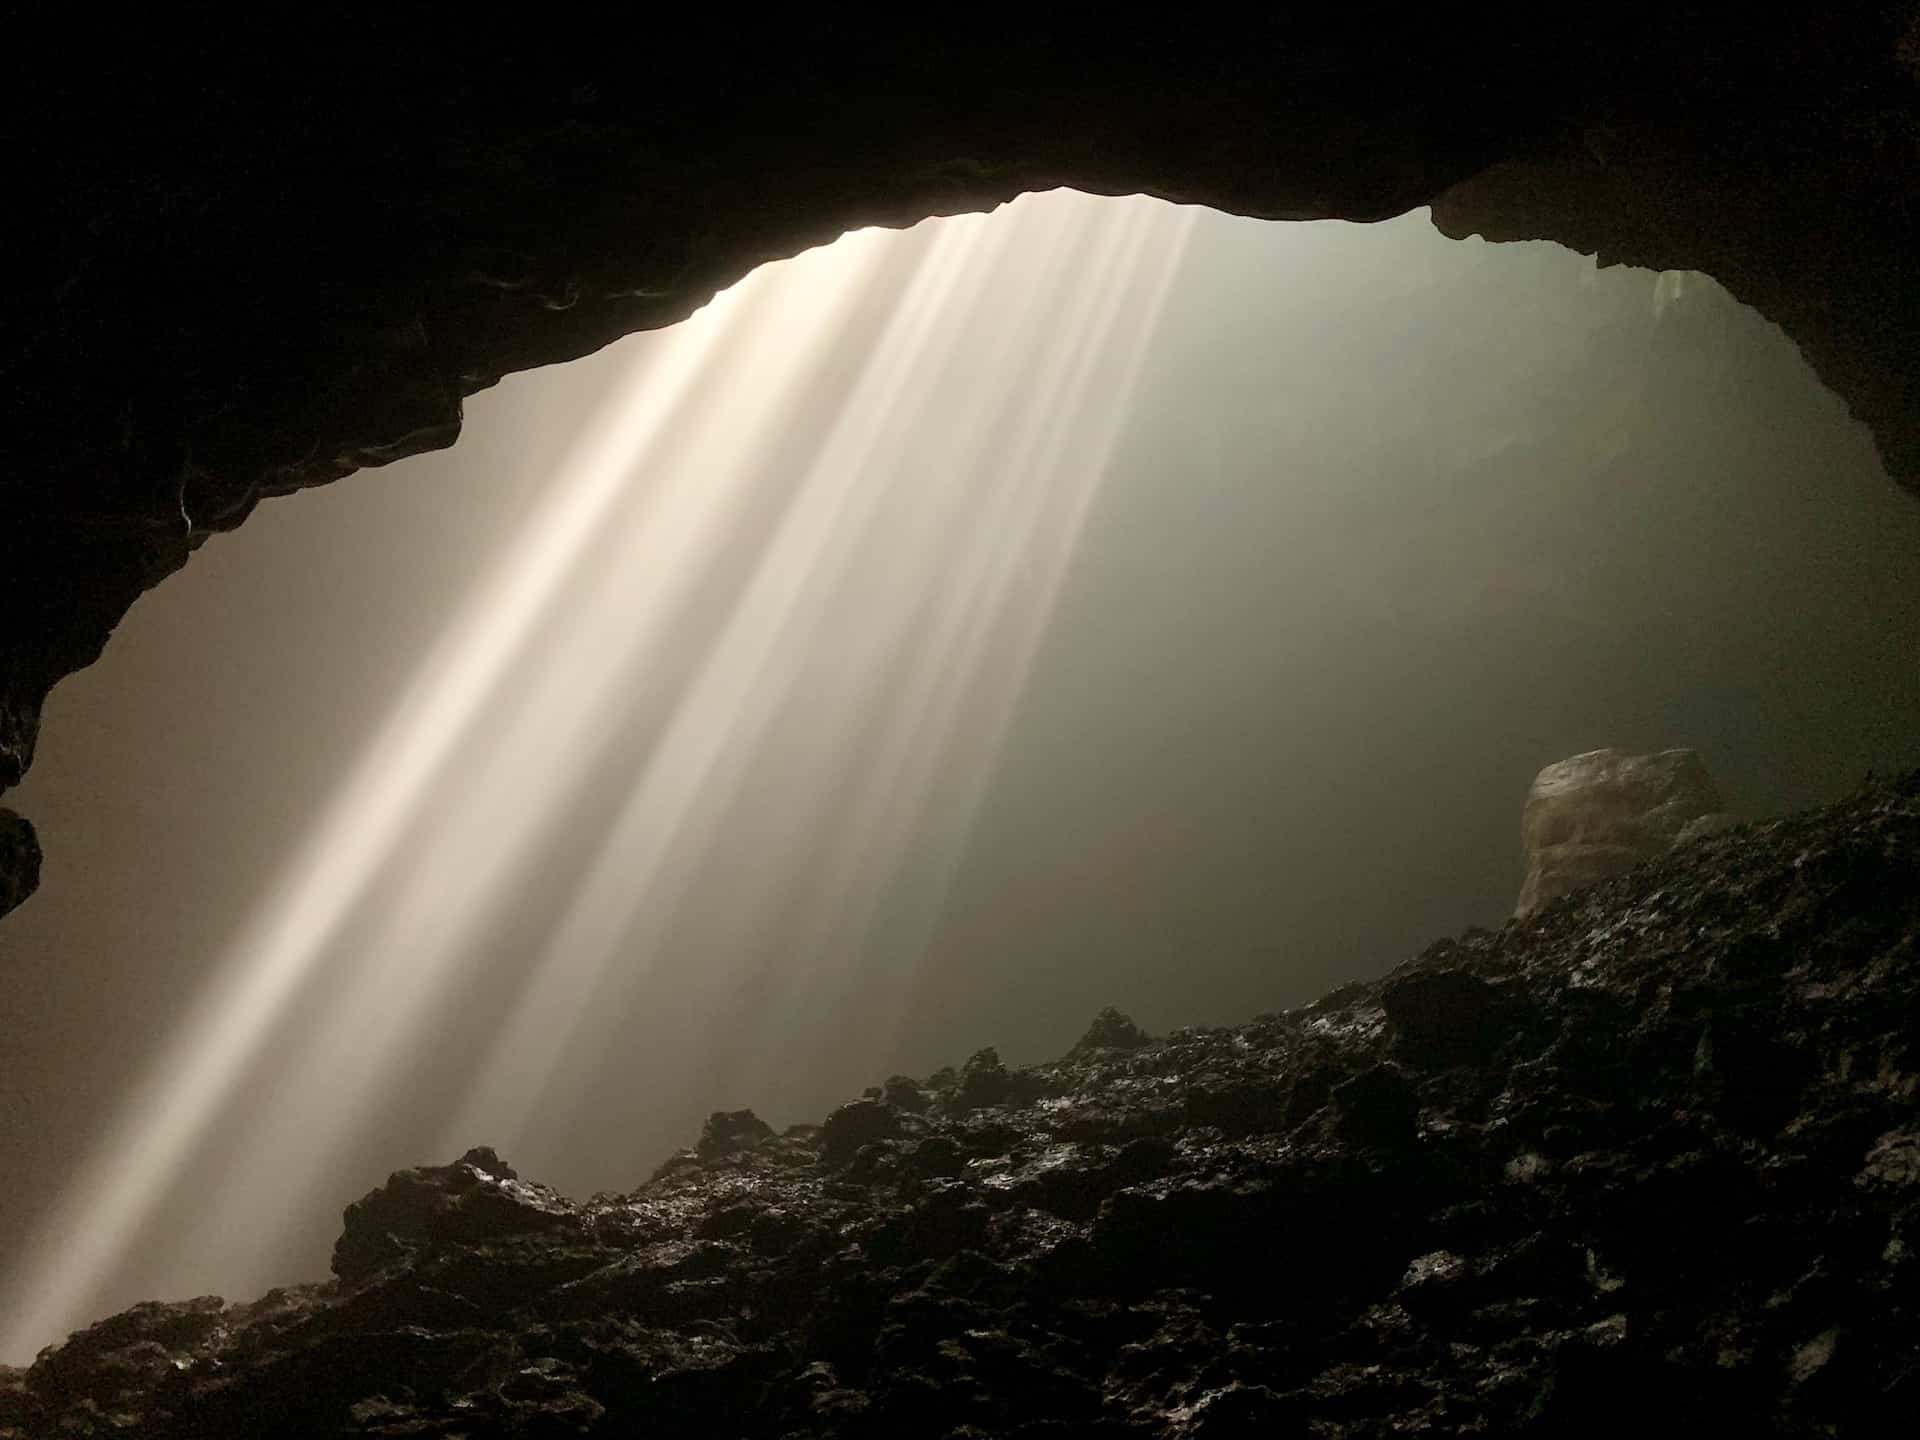 Goa Jomblang Cave